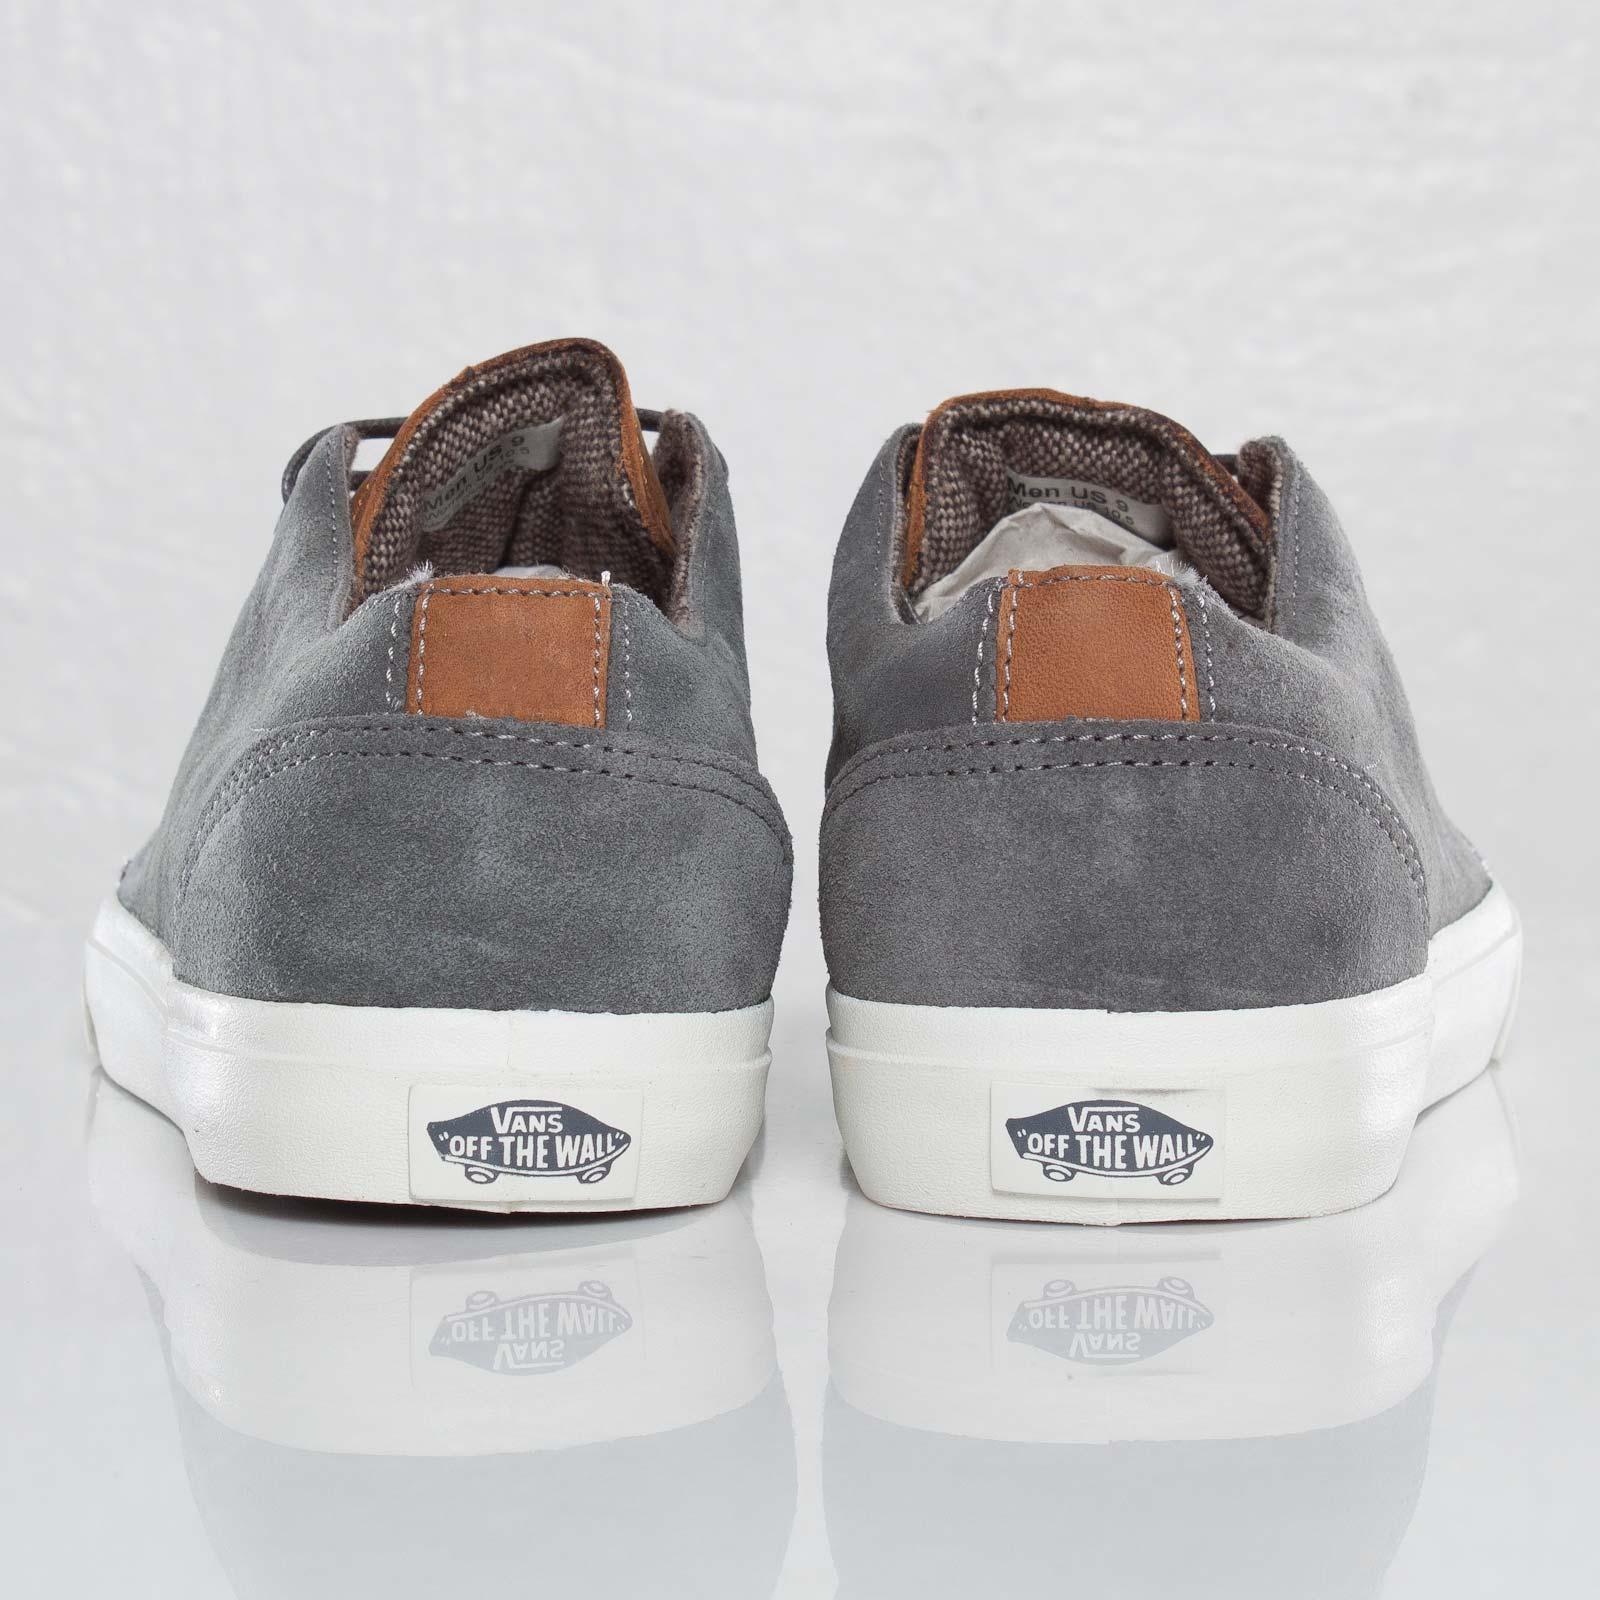 106909b06f8ca4 Vans 106 Vulcanized CA - 110951 - Sneakersnstuff